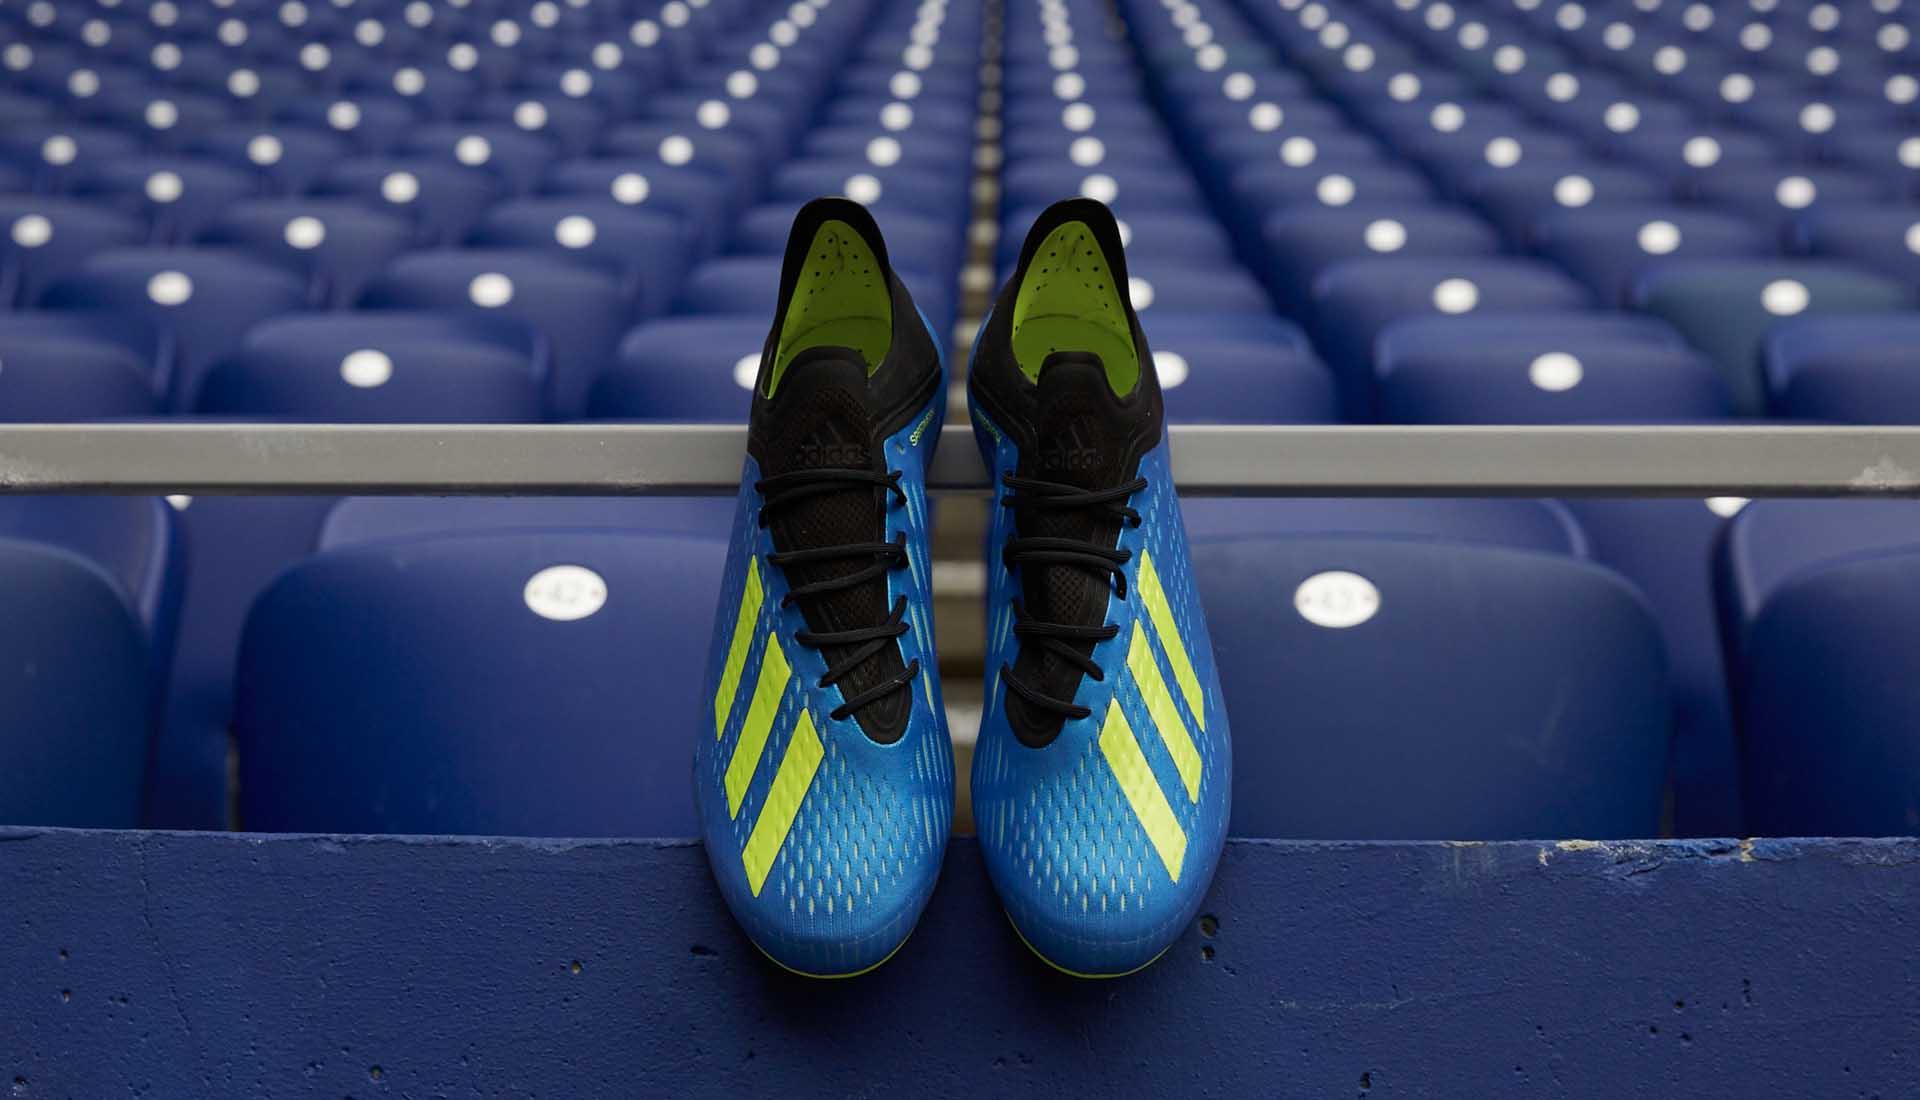 chaussures-football-adidas-X18-1-energy-mode-img2